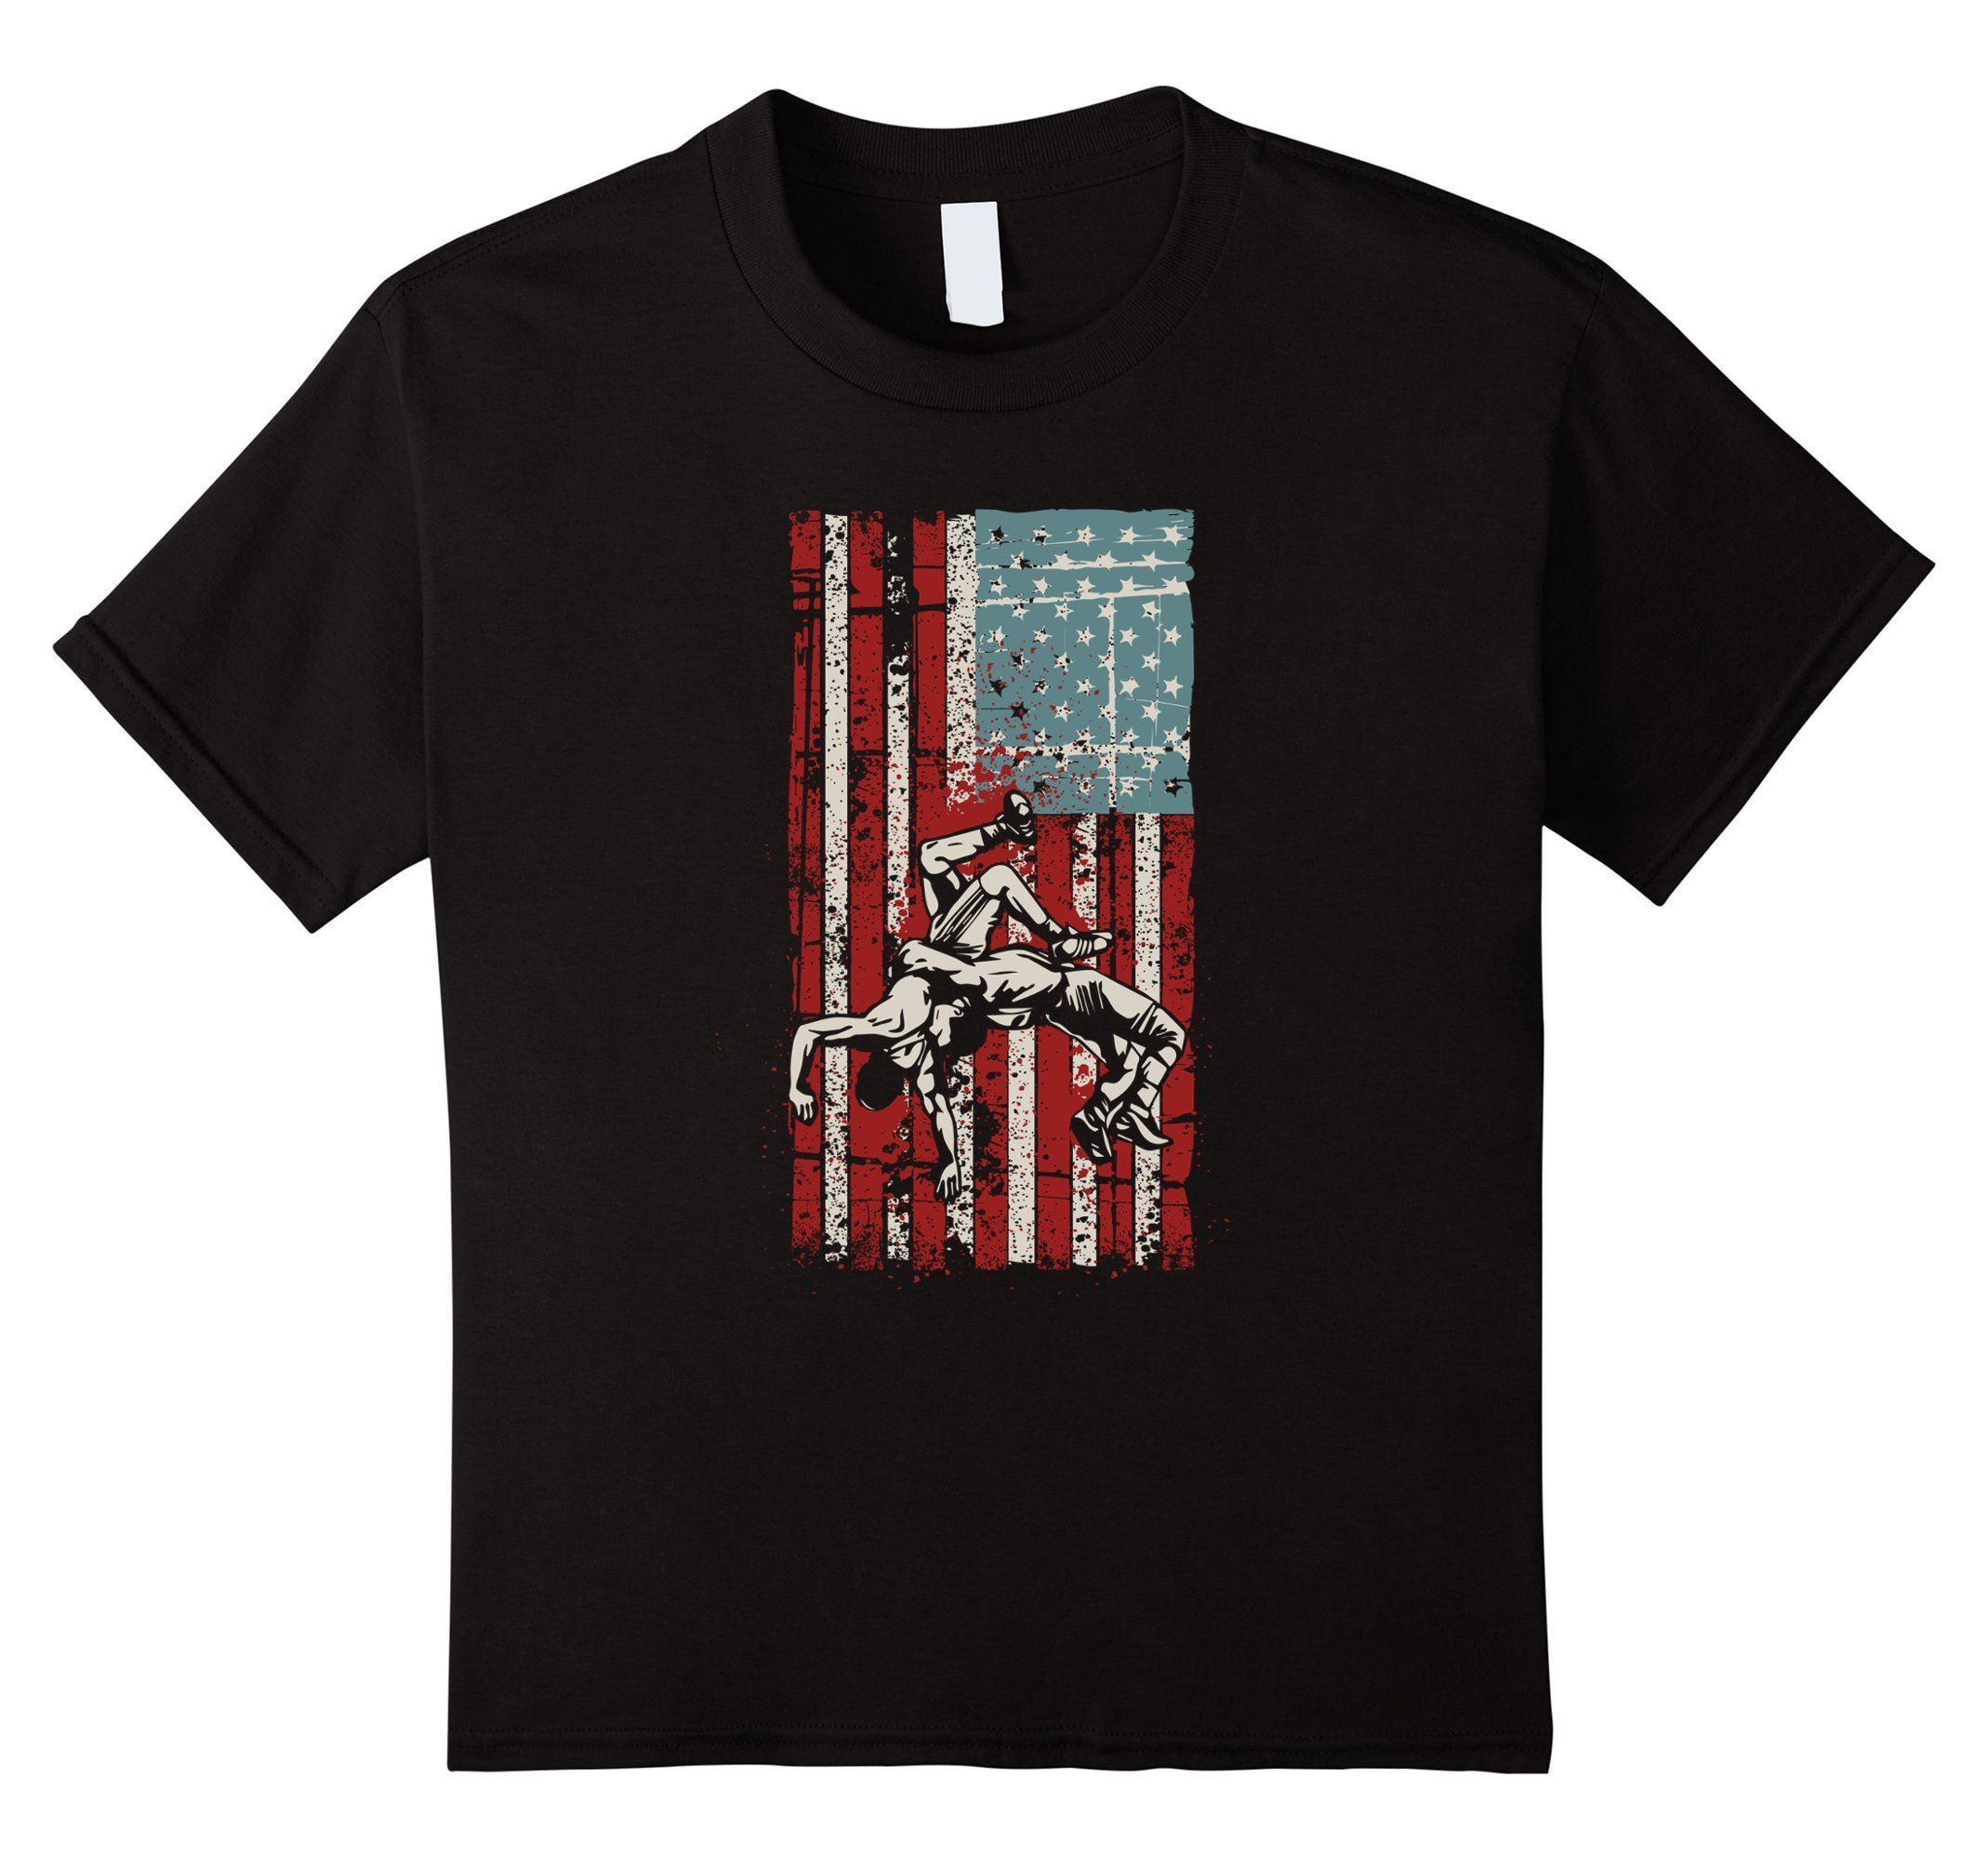 Kids Wrestling T-Shirt for Men Boys and Teens Wrestling Gifts 12 Black